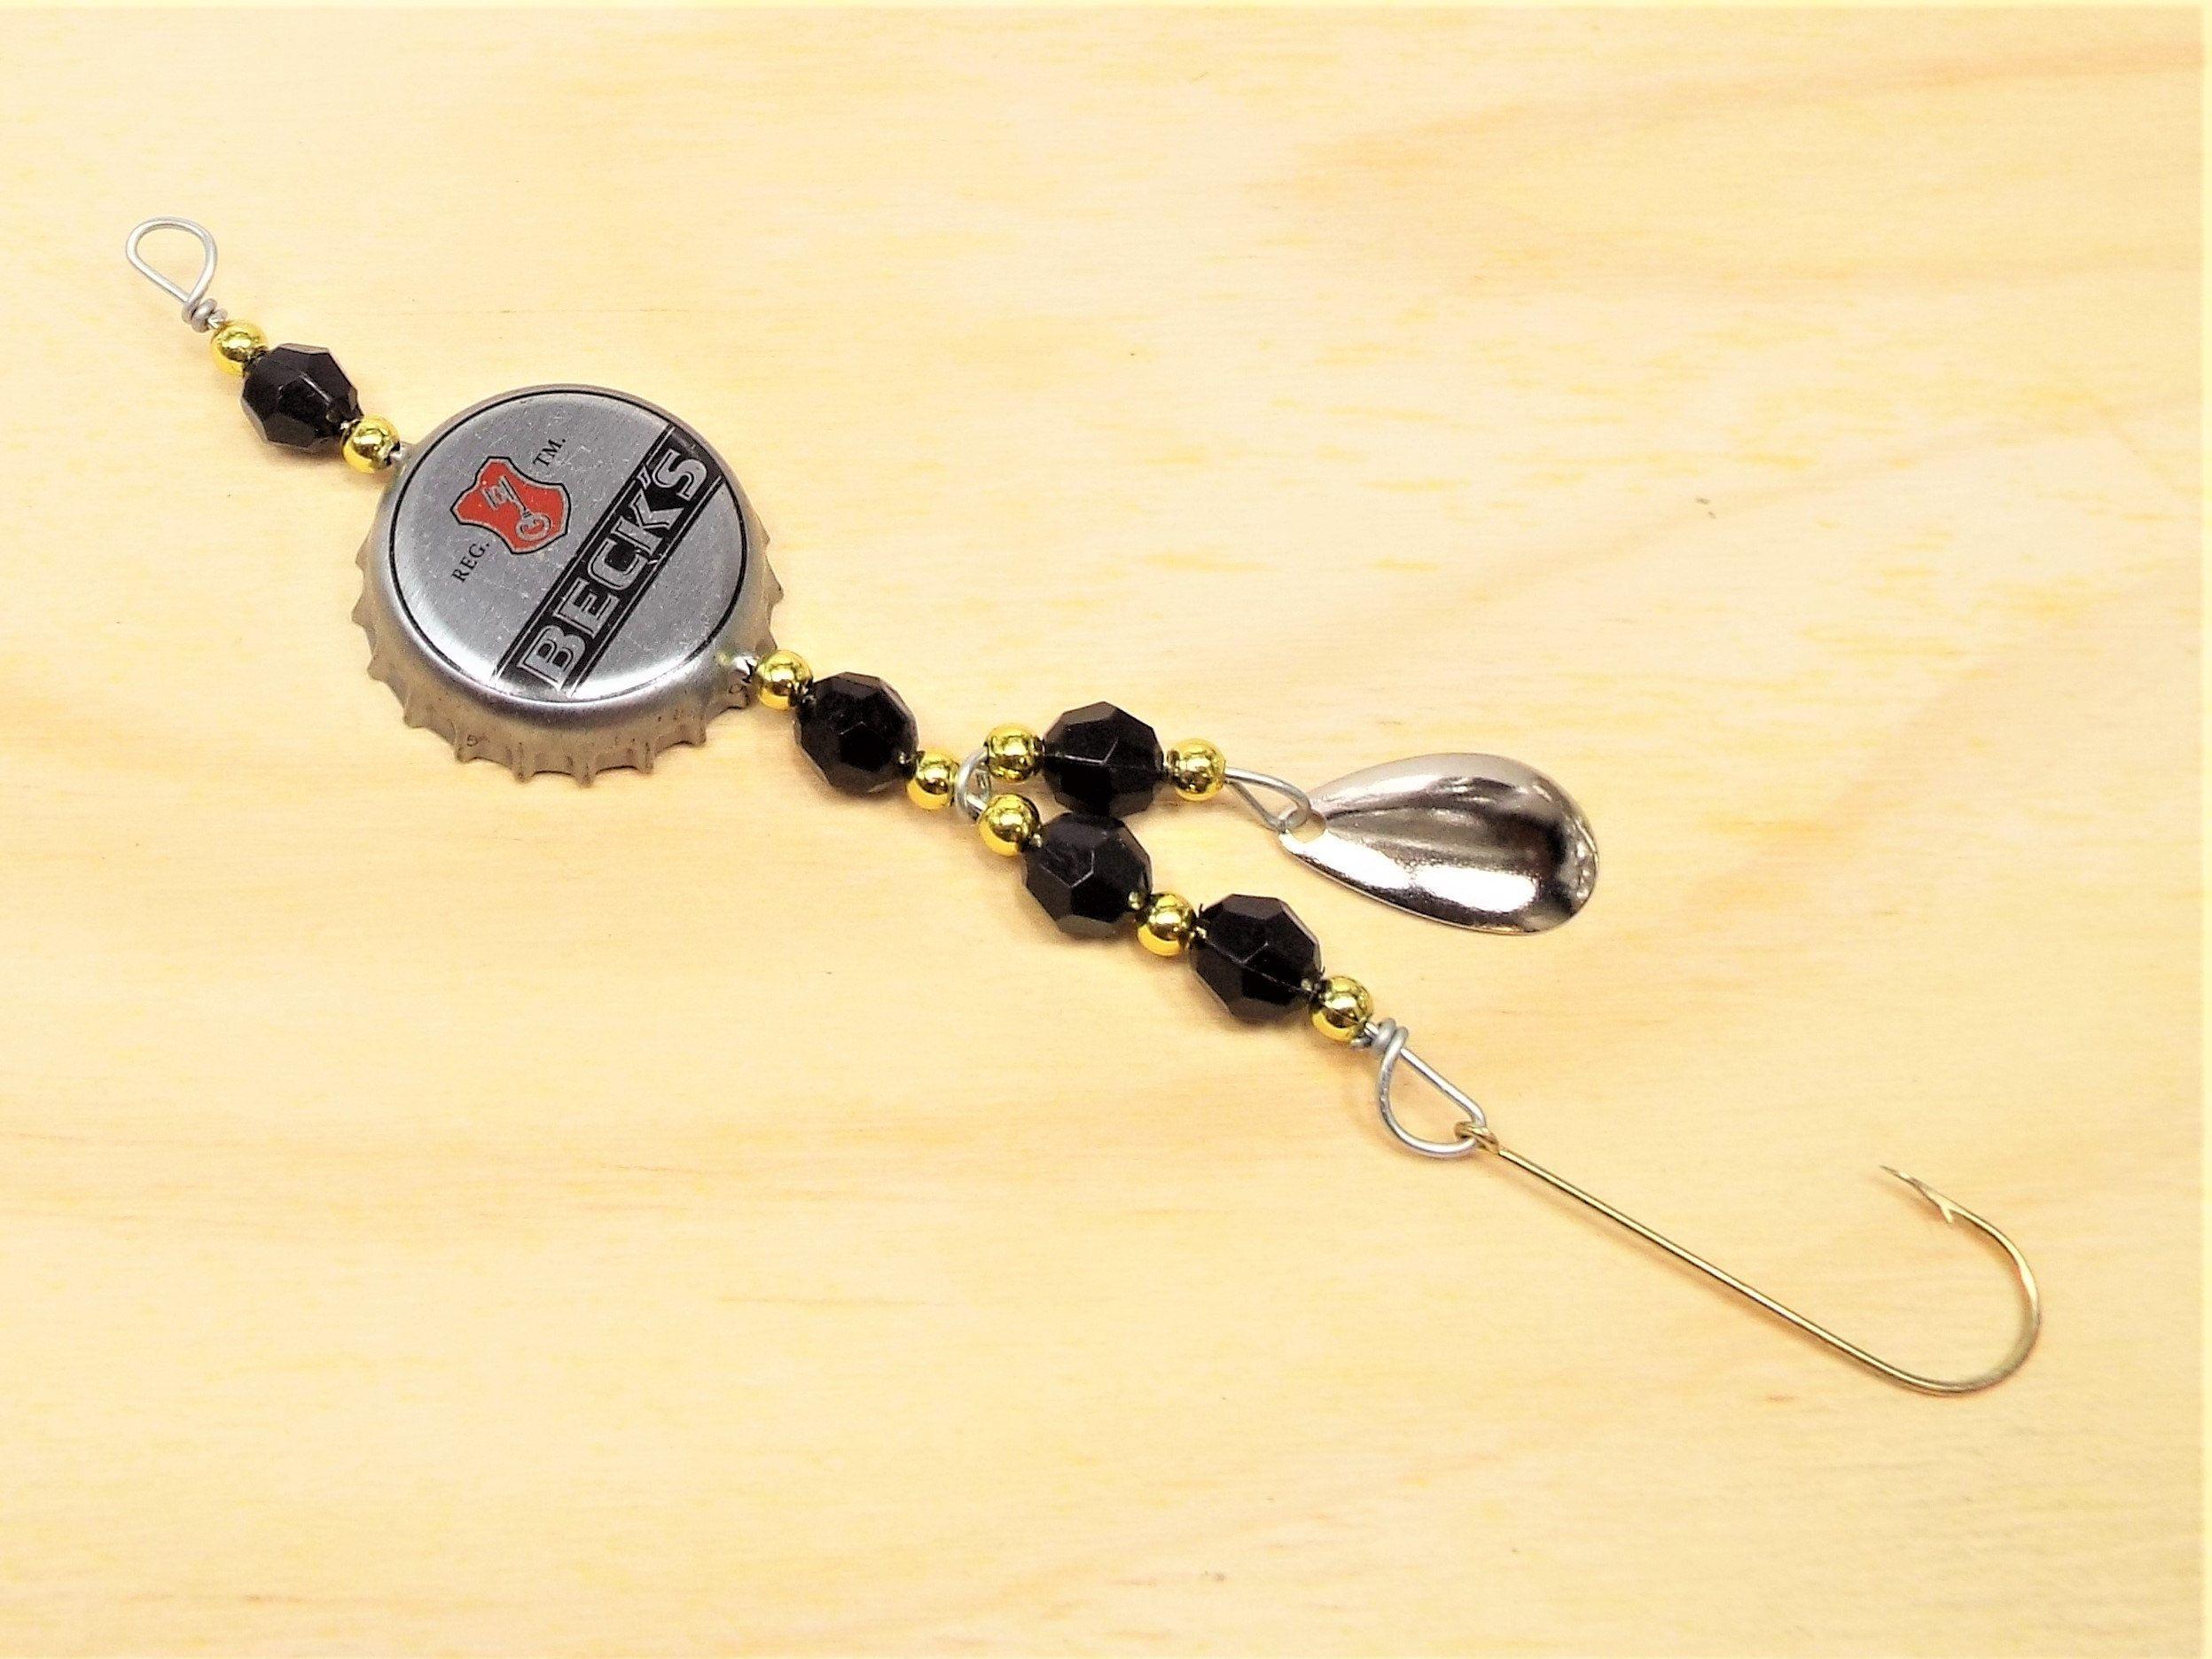 Novelty fishing lure bikini — pic 1